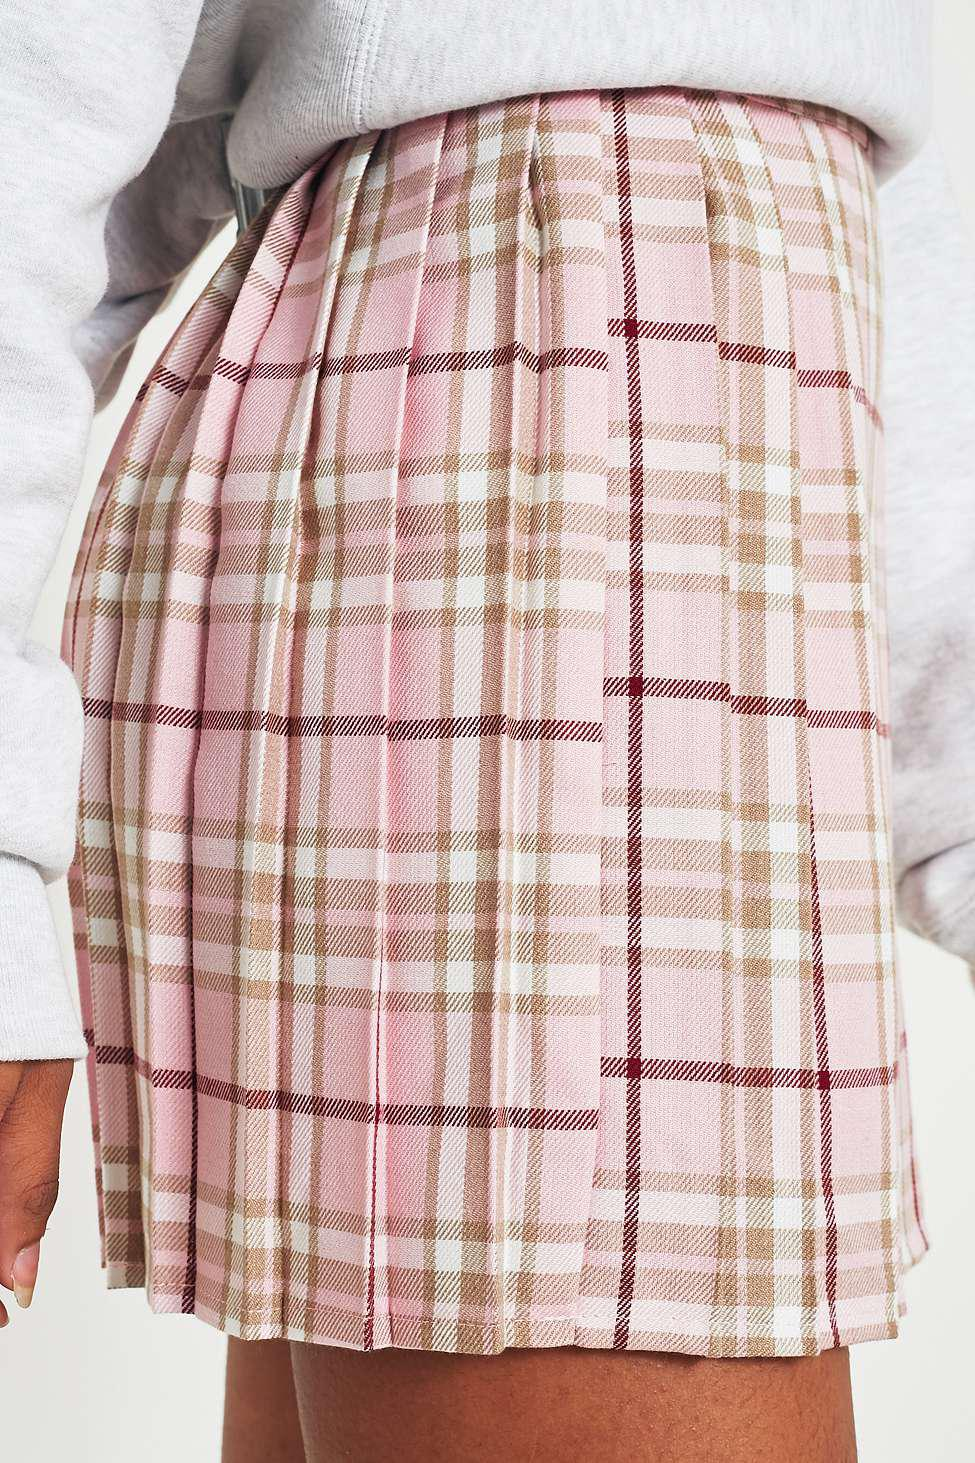 44edfb3ba Urban Renewal Vintage Re-made Pink Tartan Plaid Skirt - Womens L in ...